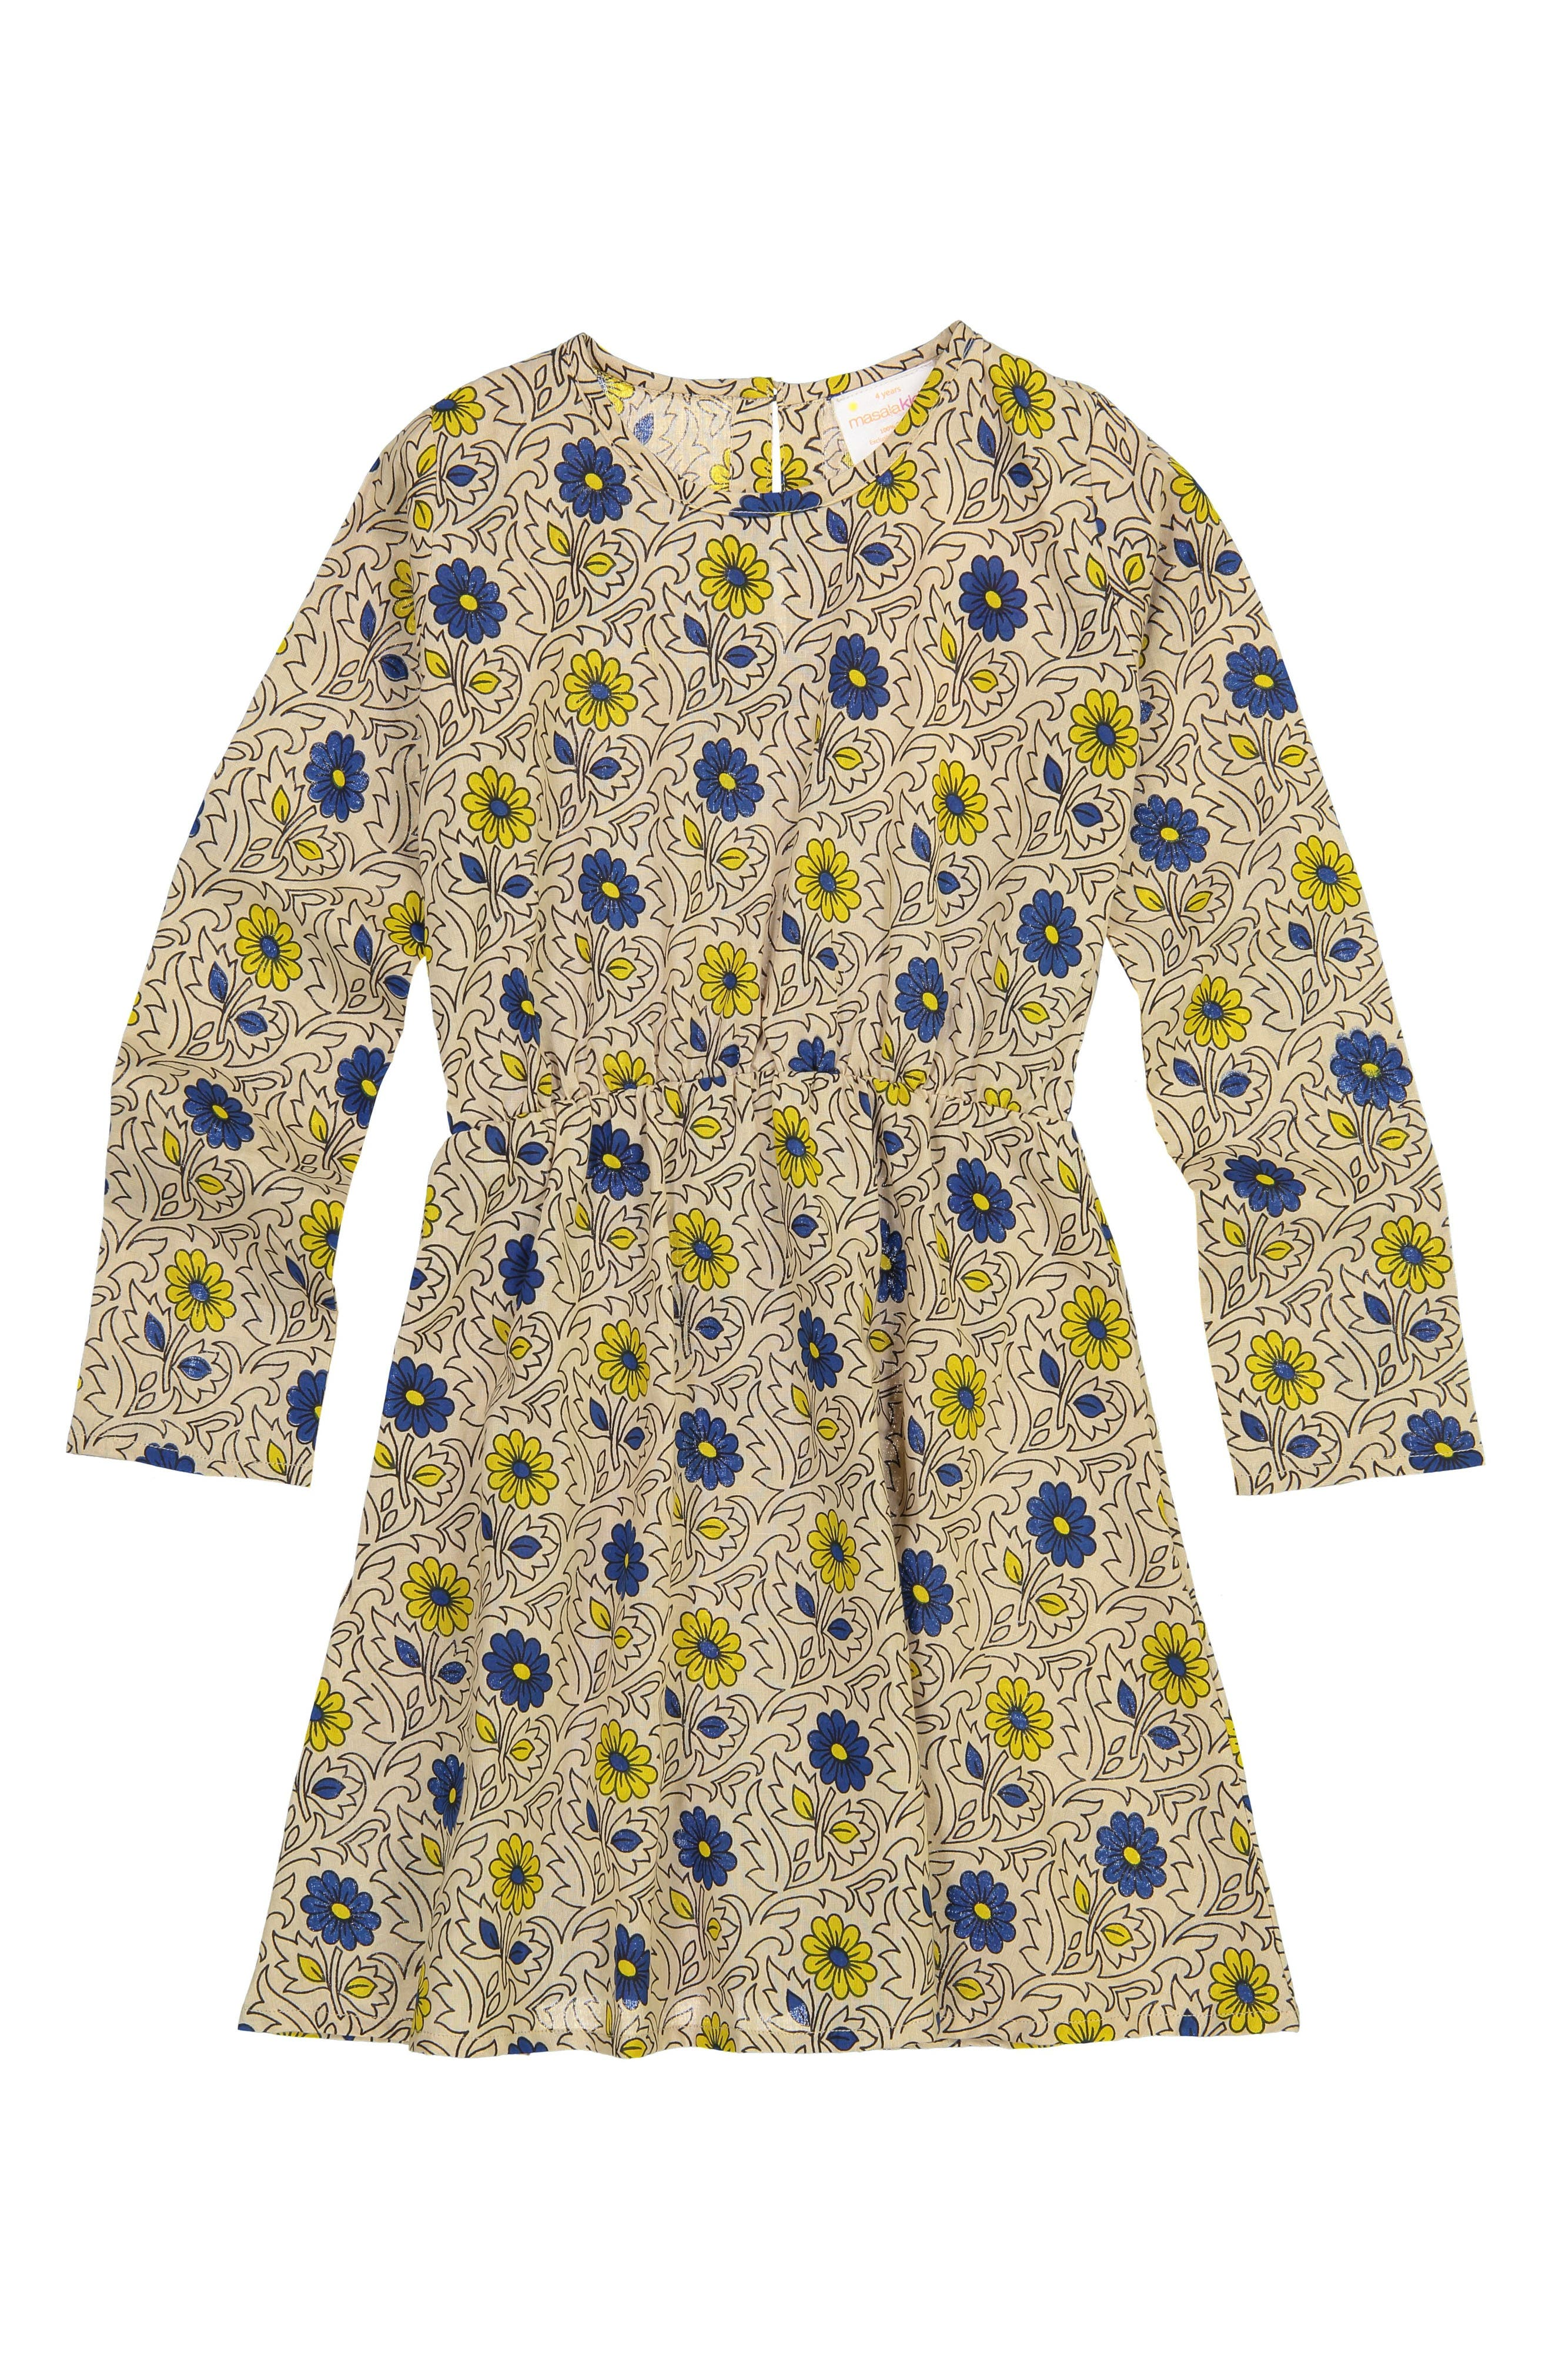 Misha Garden Sand Dress,                             Alternate thumbnail 2, color,                             SAND